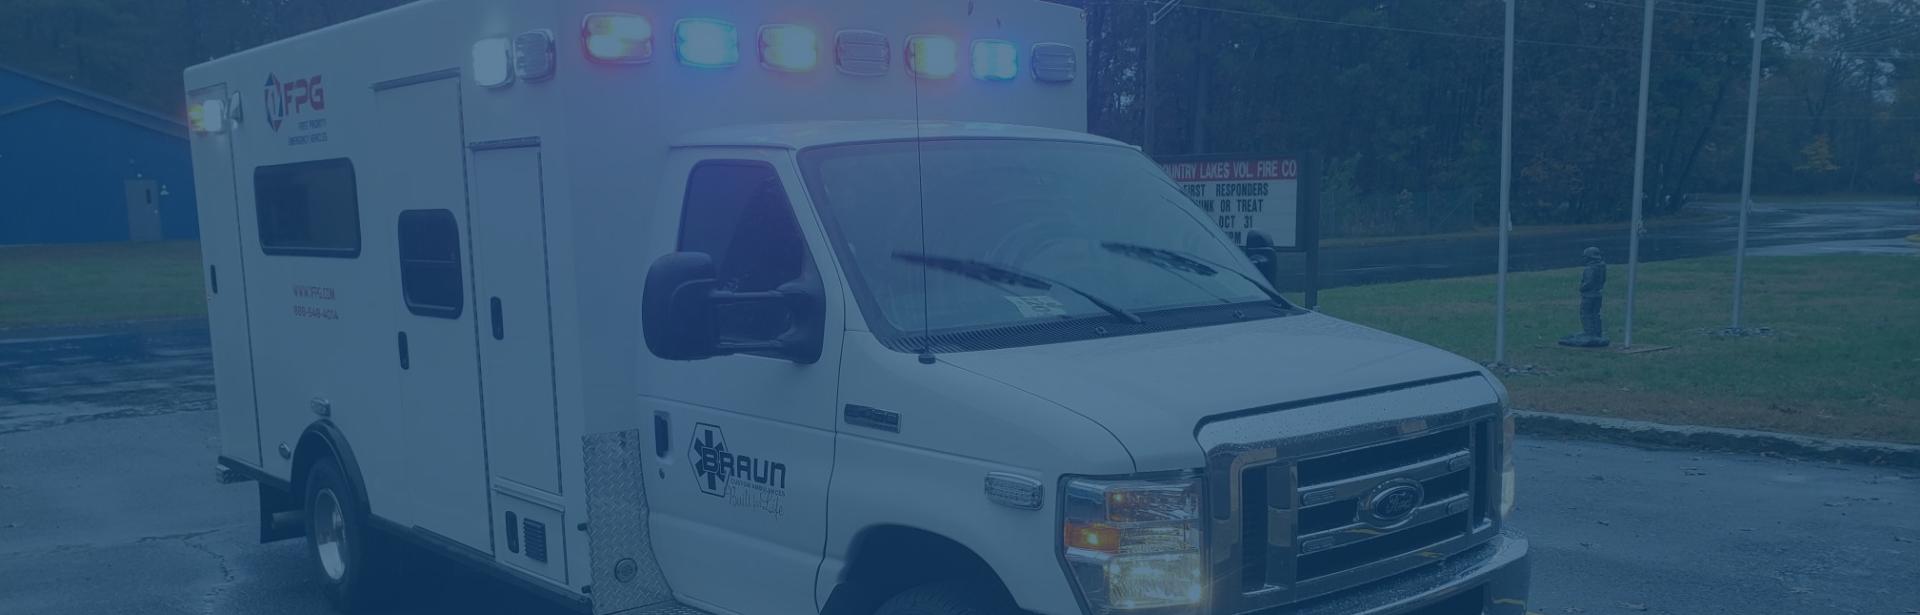 First Priority Emergency Vehicles Ambulance Remount Demos